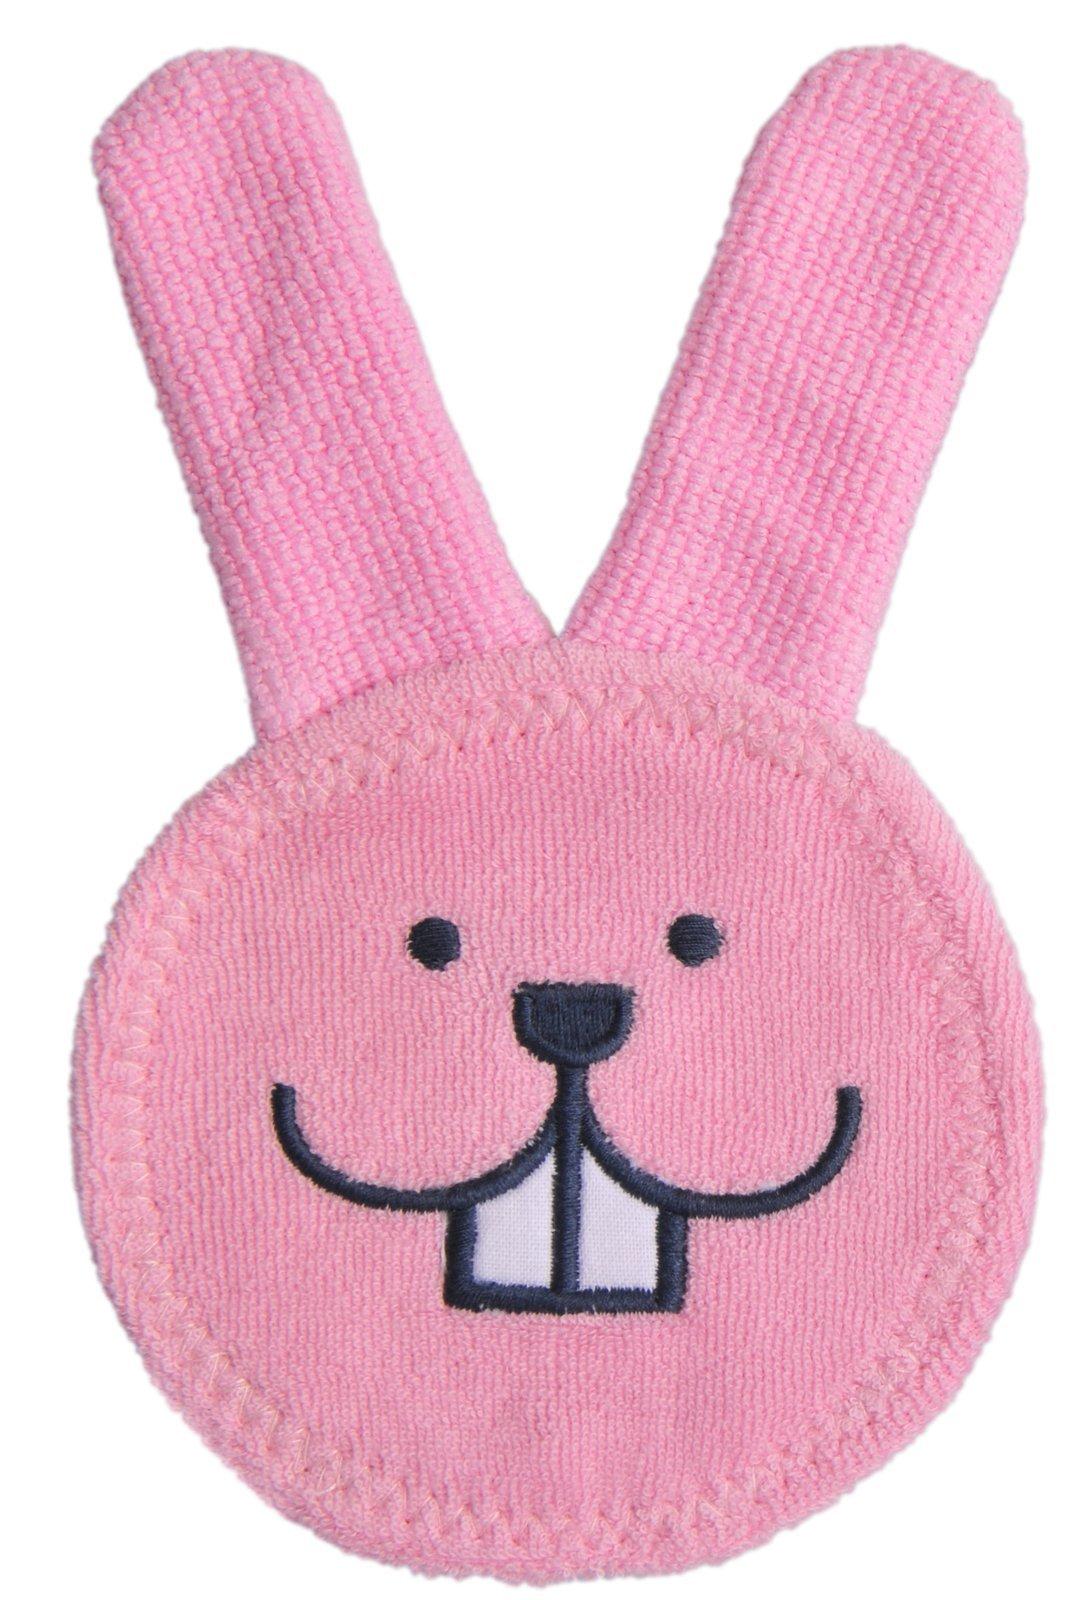 MAM Oral Care Rabbit - Pink